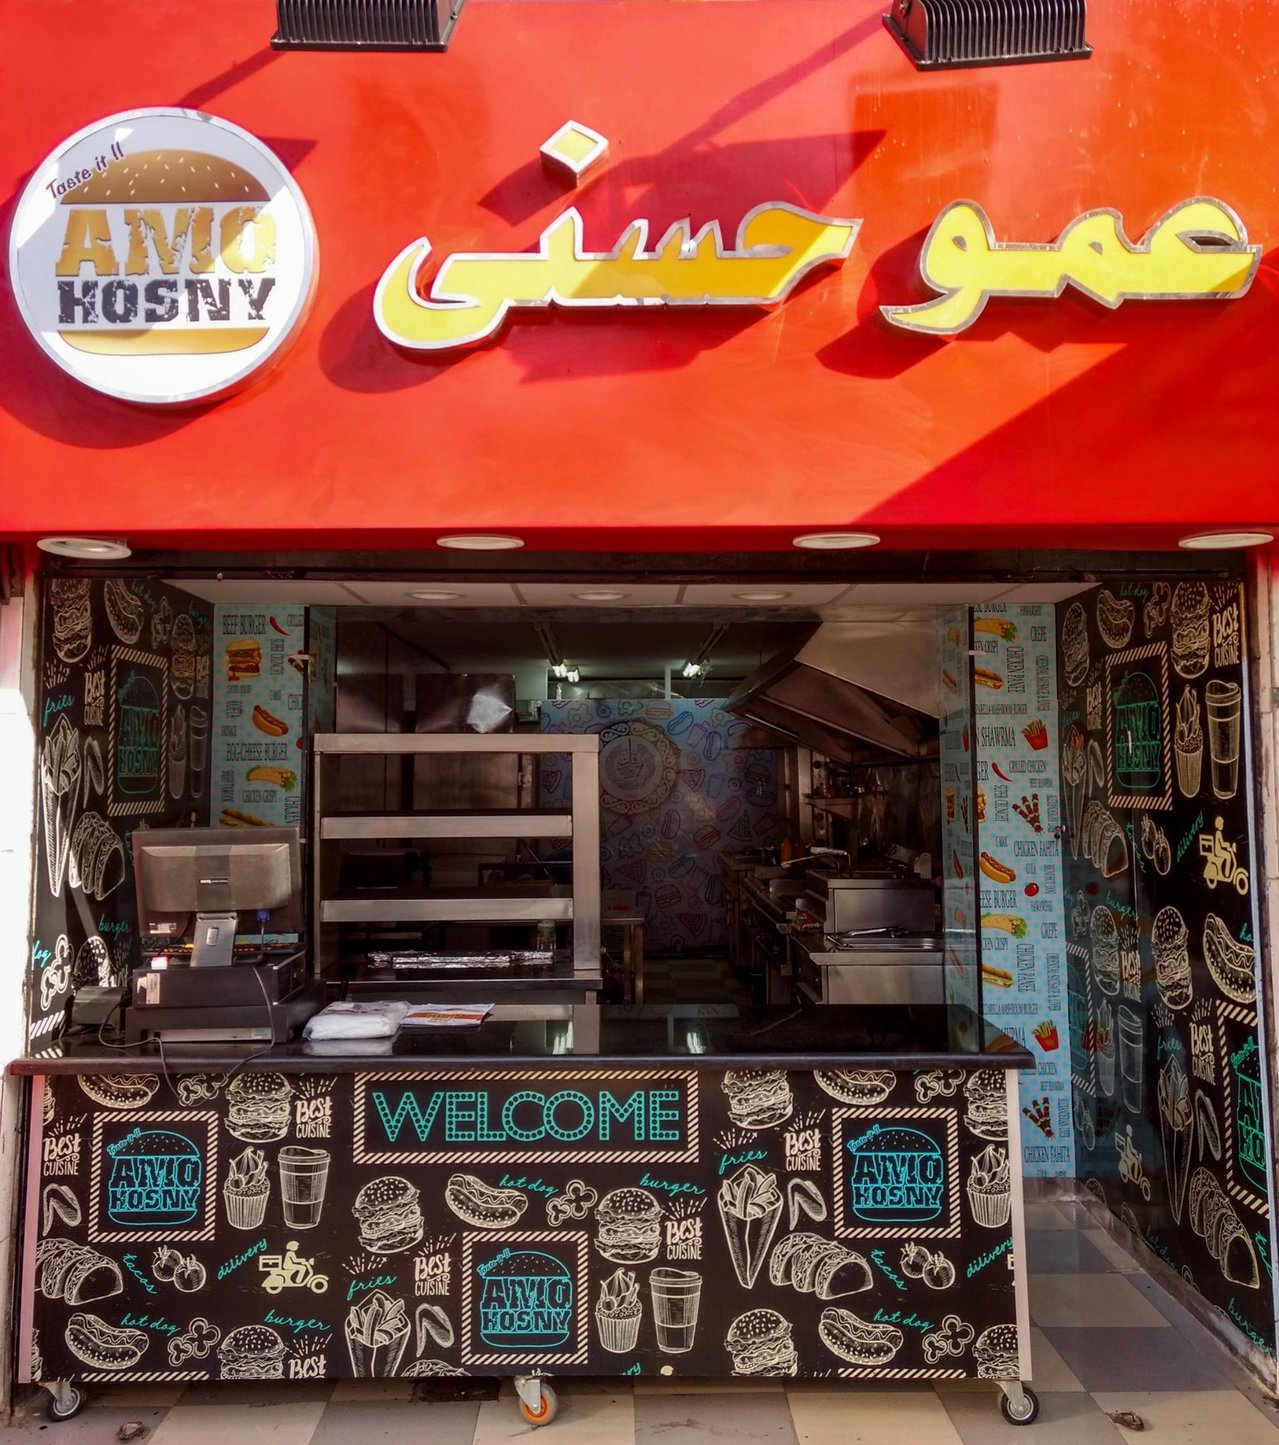 أسعار منيو ورقم وعنوان فروع مطعم عمو حسني Amo Hosny